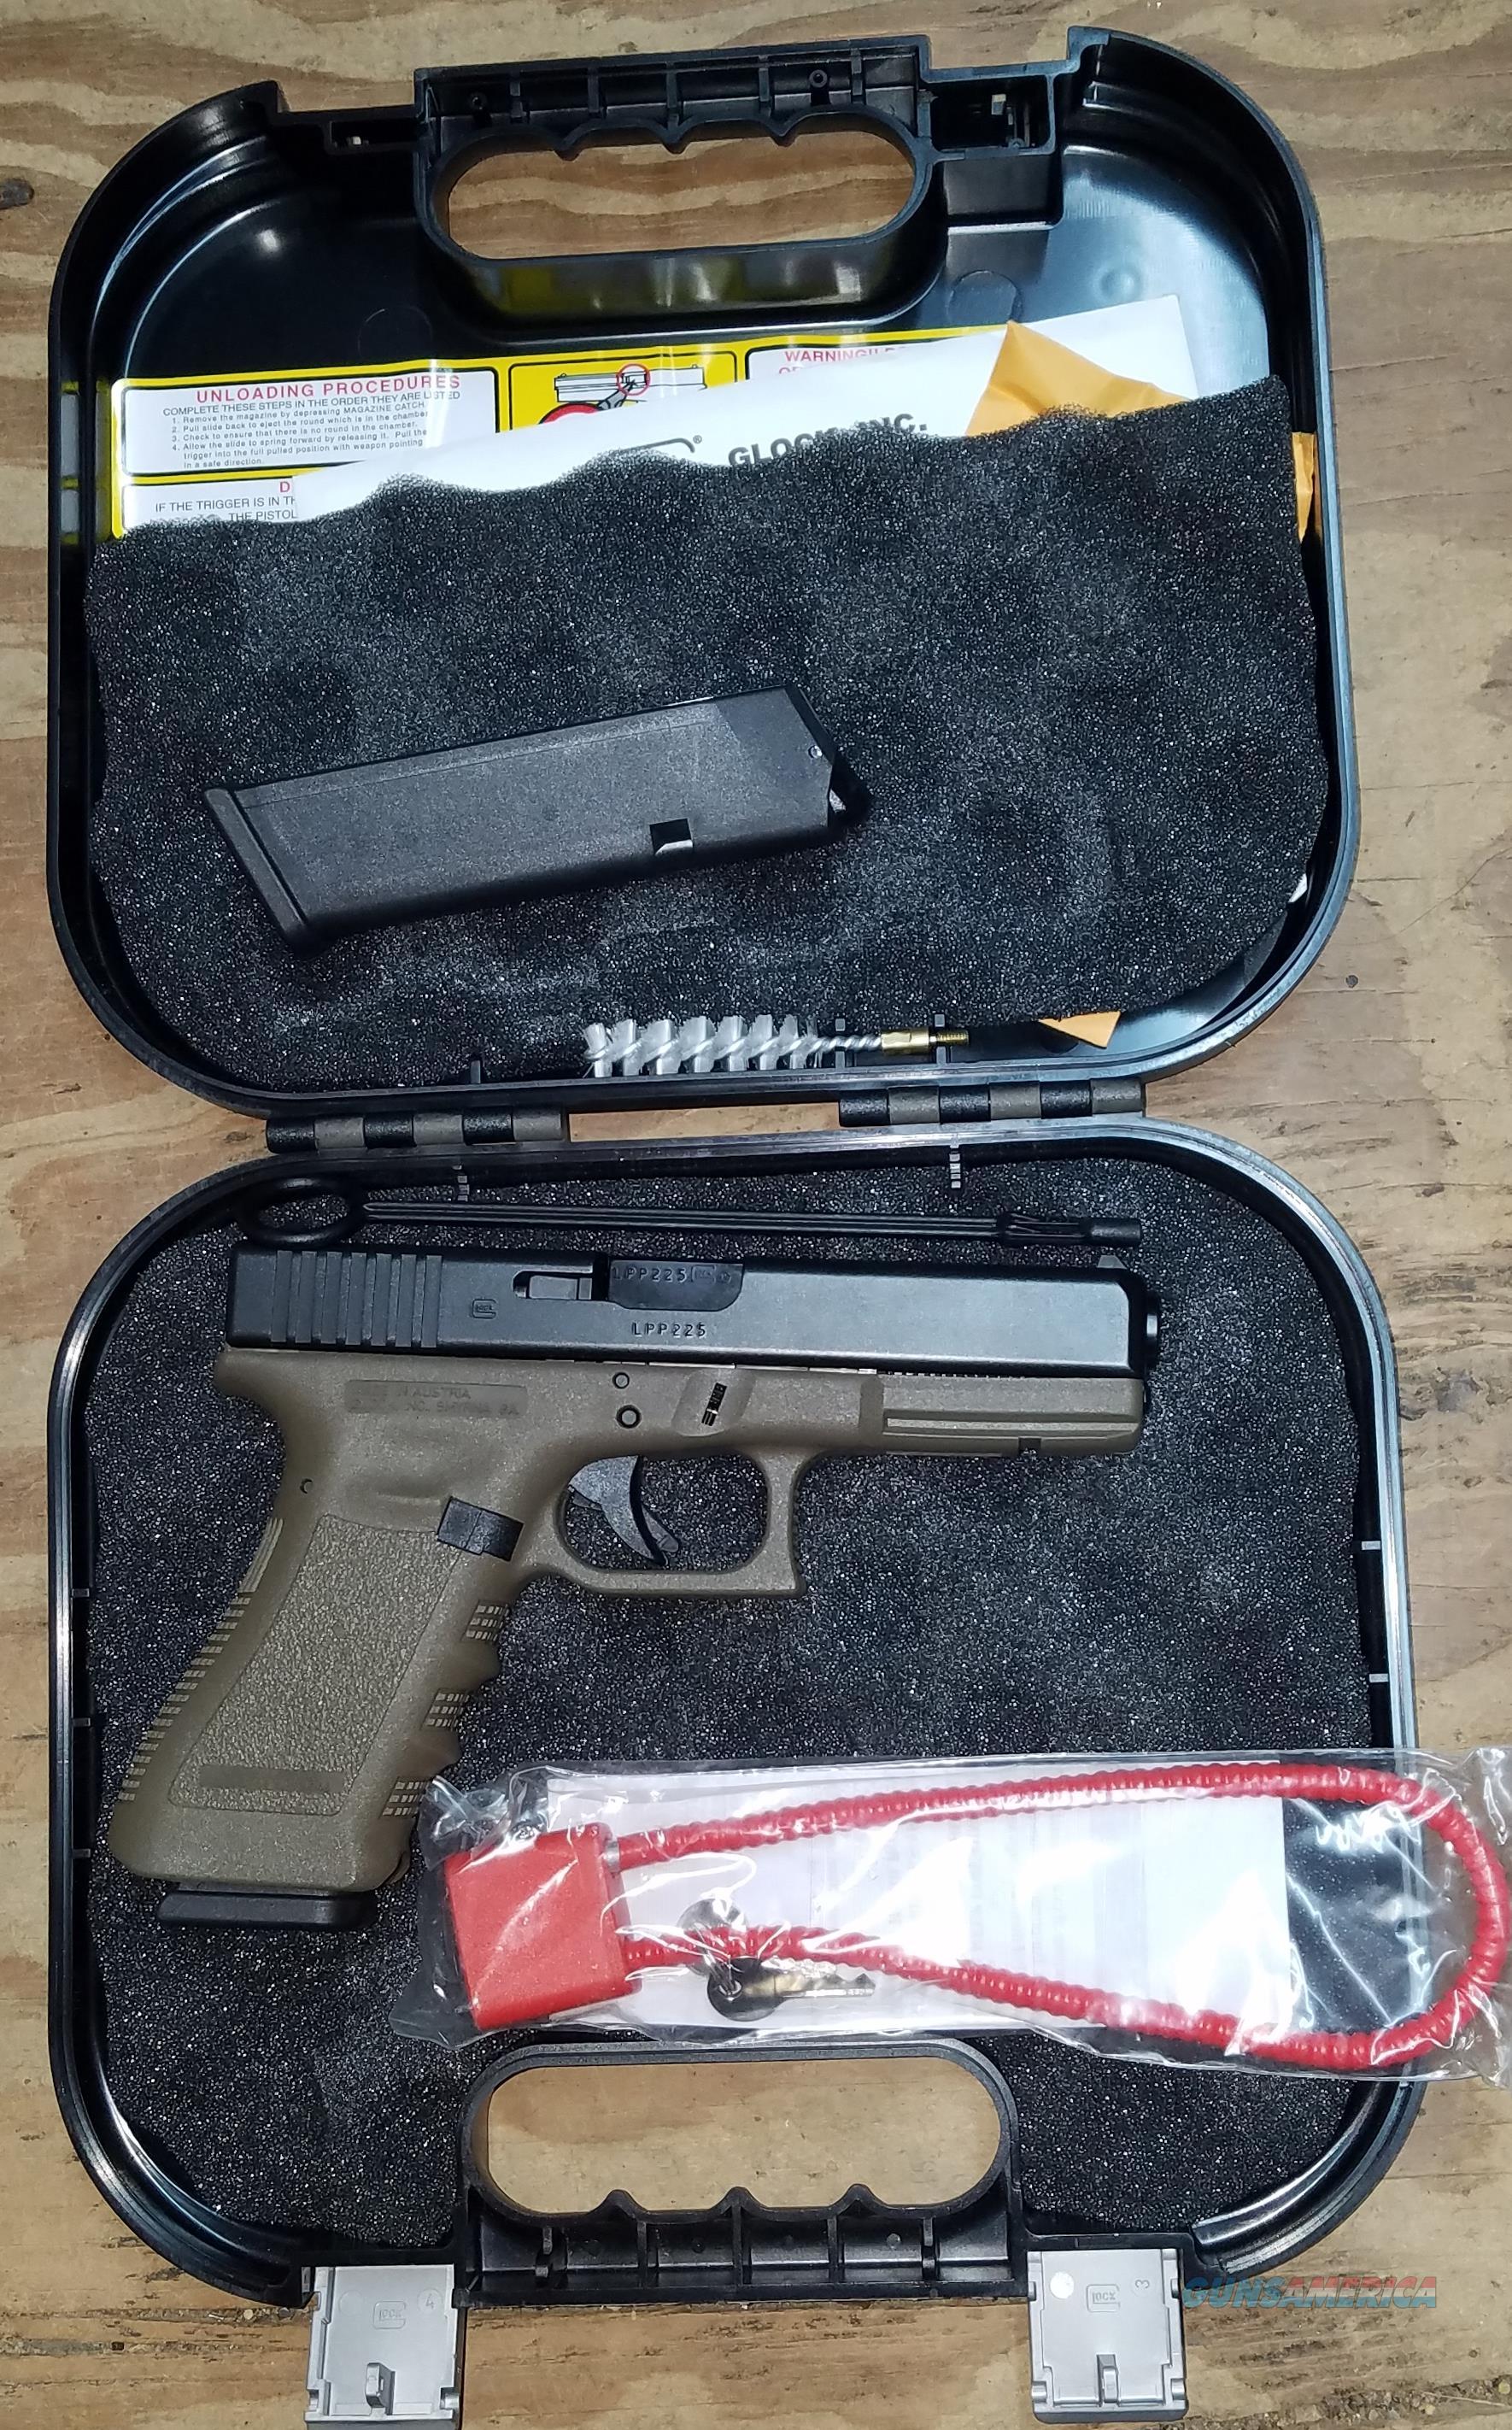 Glock 37 P137572 Olive Drab Green 45 GAP Pistol  Guns > Pistols > Glock Pistols > 37